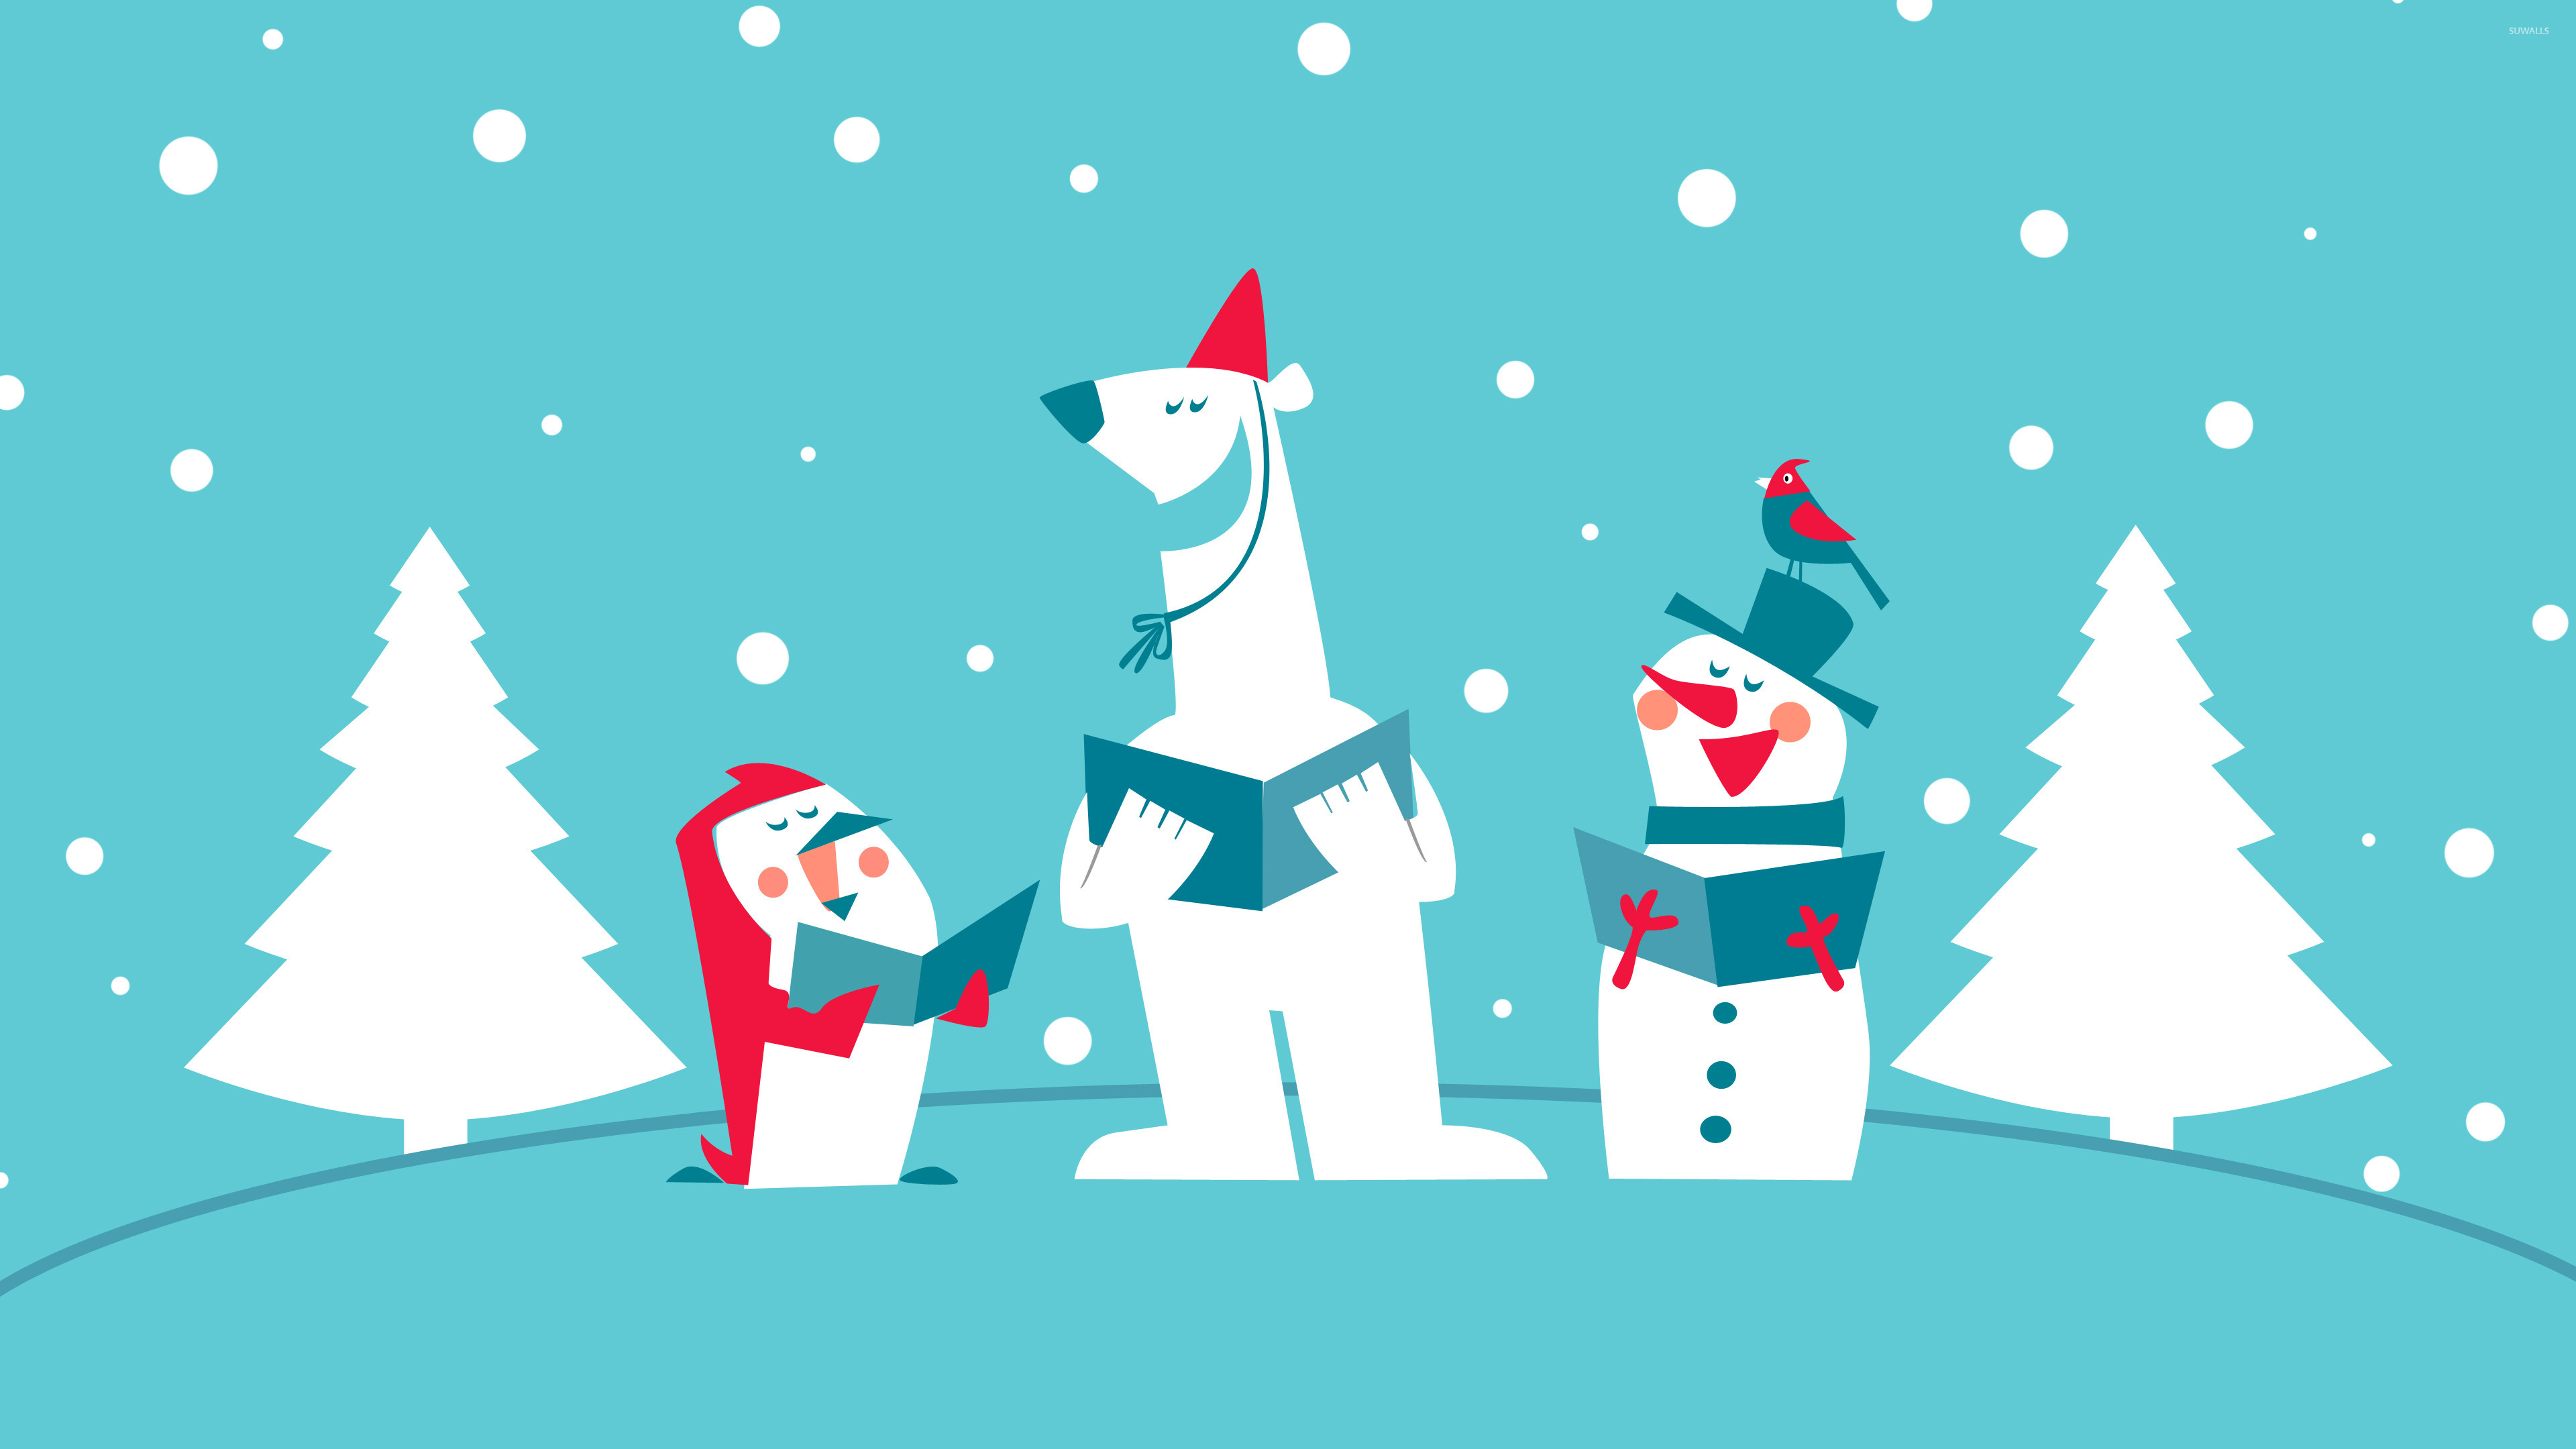 Funny Christmas carol group wallpaper jpg